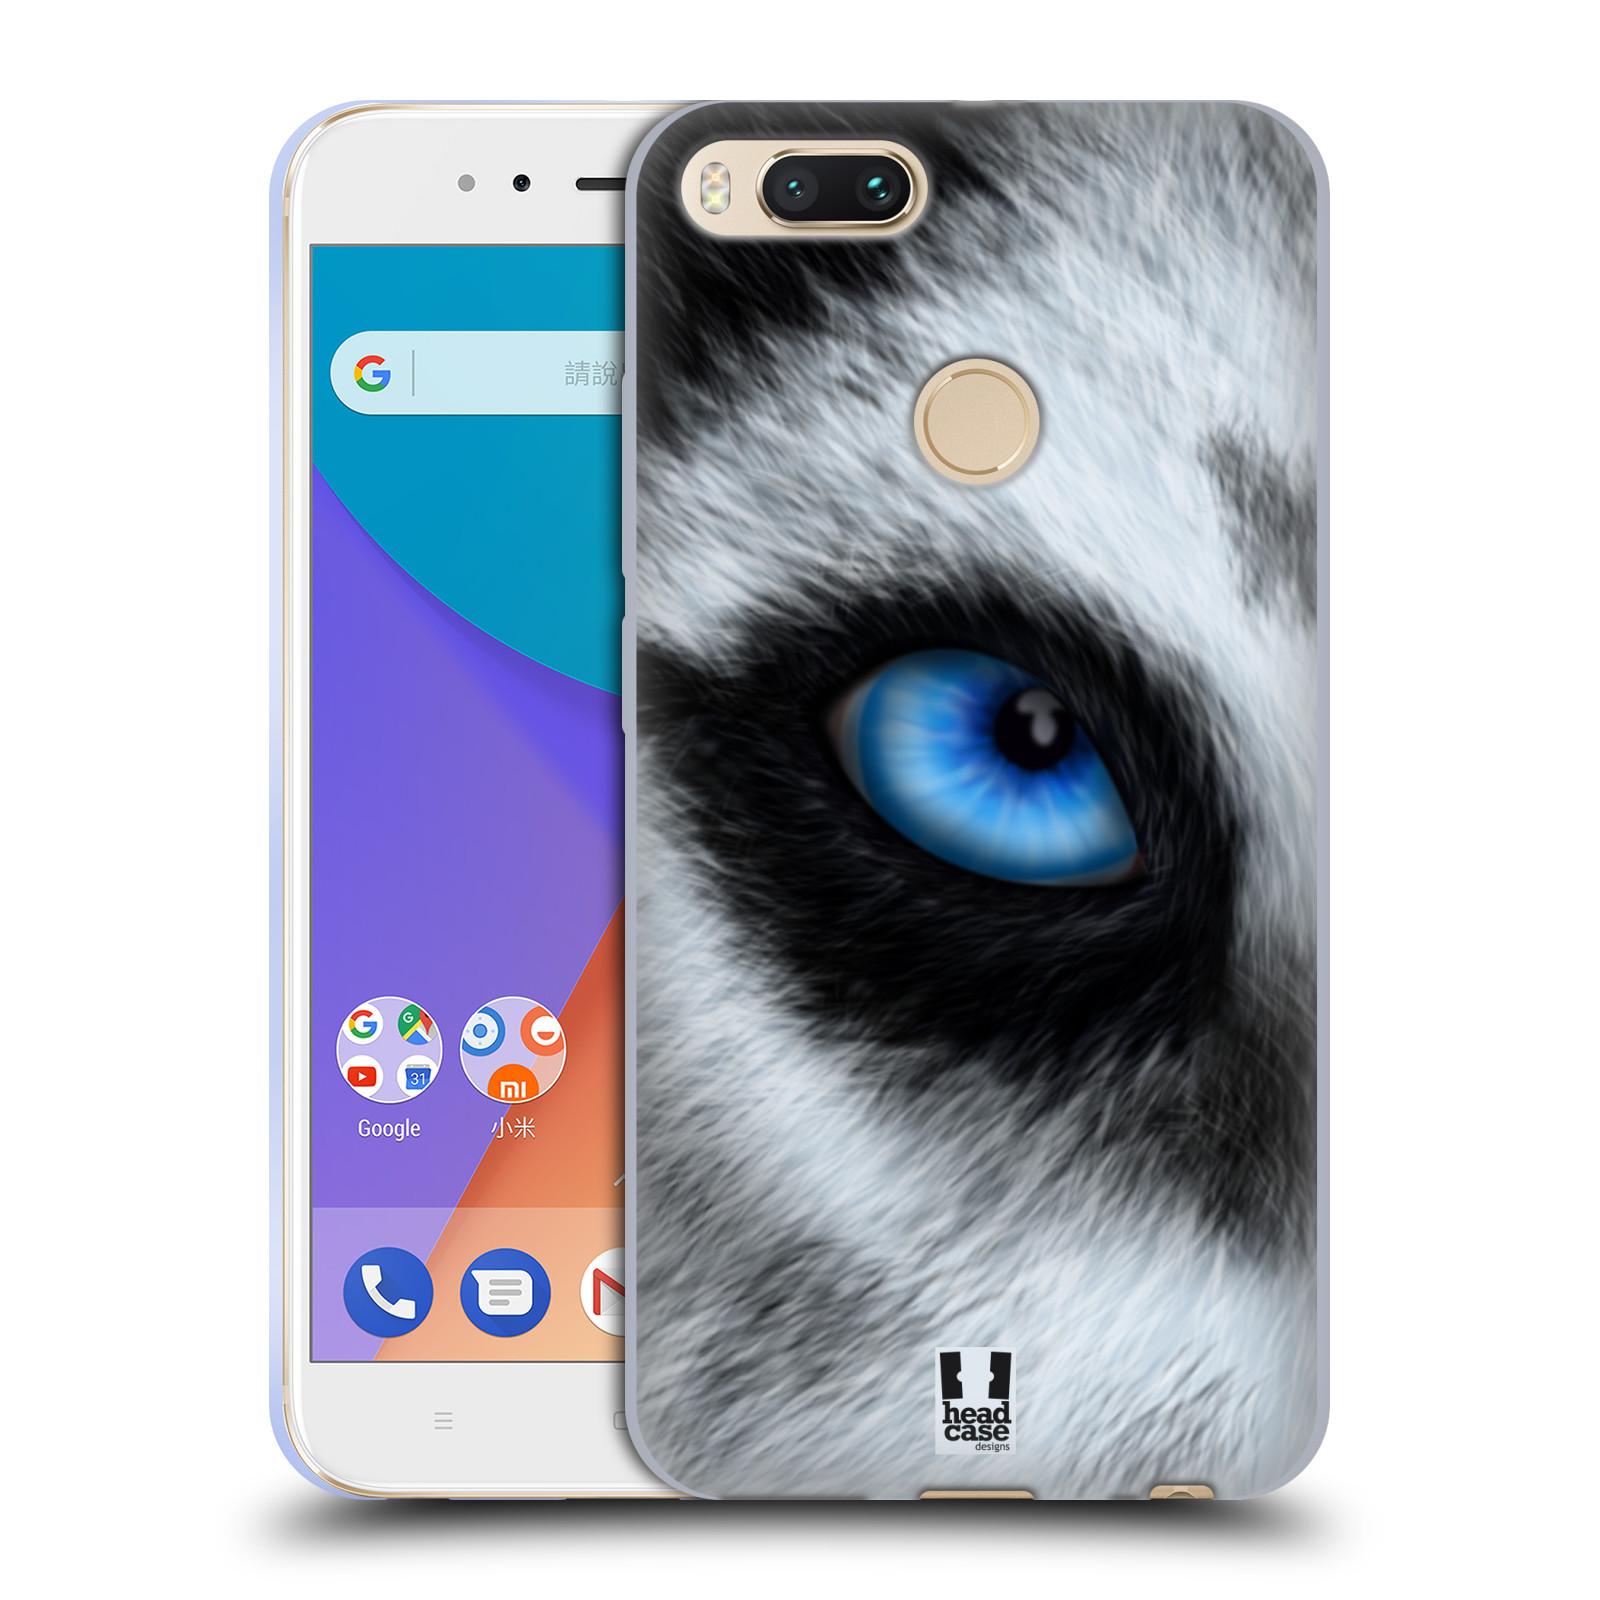 Silikonové pouzdro na mobil Xiaomi Mi A1 vzor pohled zvířete oko pes husky